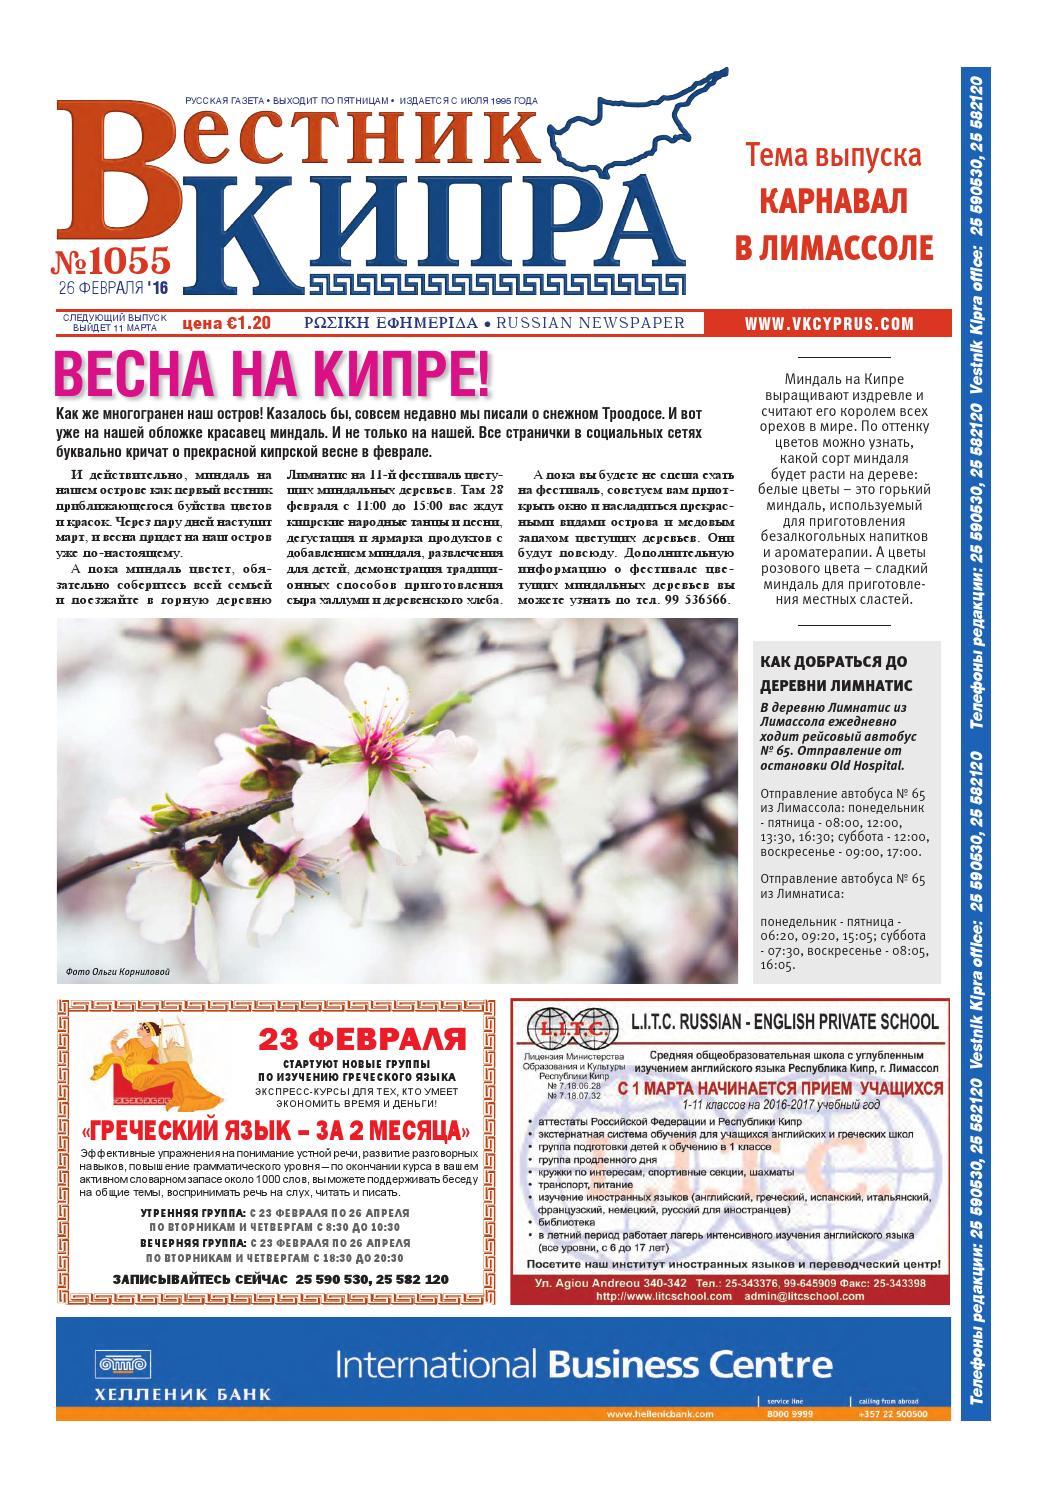 aprilia leonardo инструкция на русском